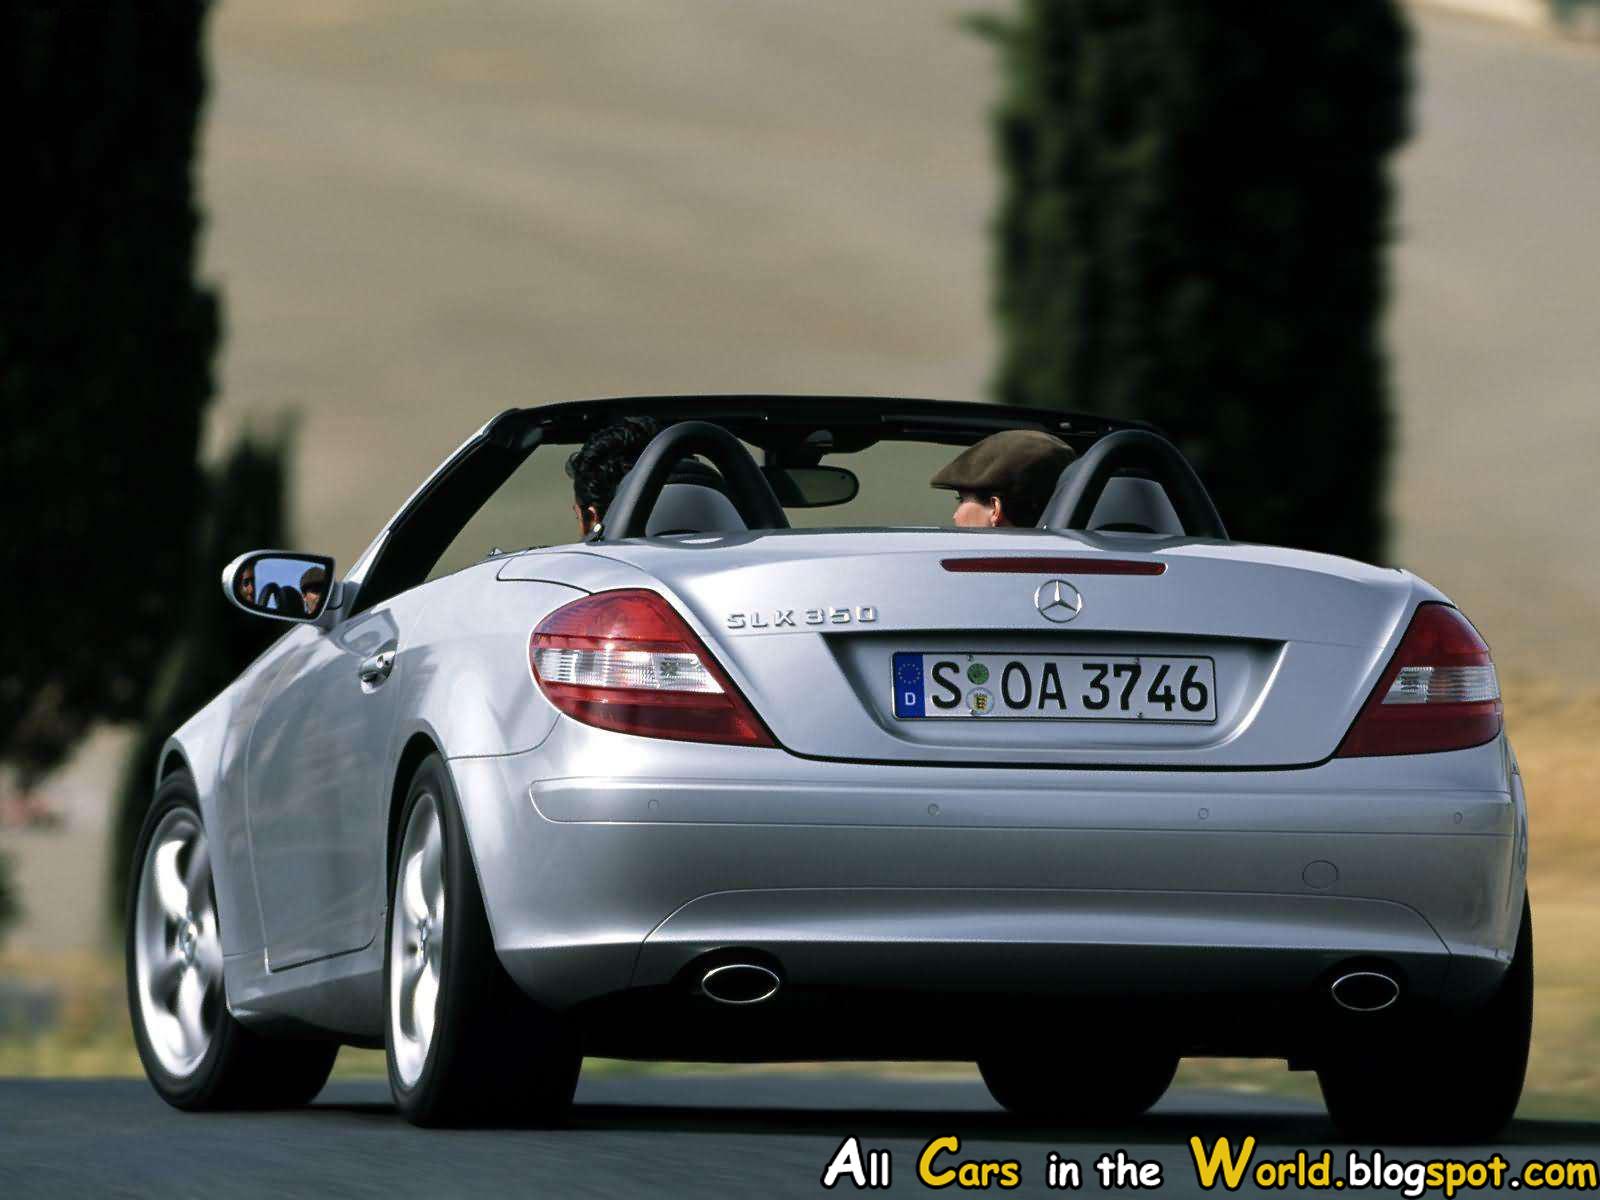 http://4.bp.blogspot.com/-BULX-Yf_Mq4/UD-LLWTsY_I/AAAAAAAACik/8xAUfMrCx-g/s1600/Mercedes-Benz-SLK350_2005_1600x1200_wallpaper_27.jpg